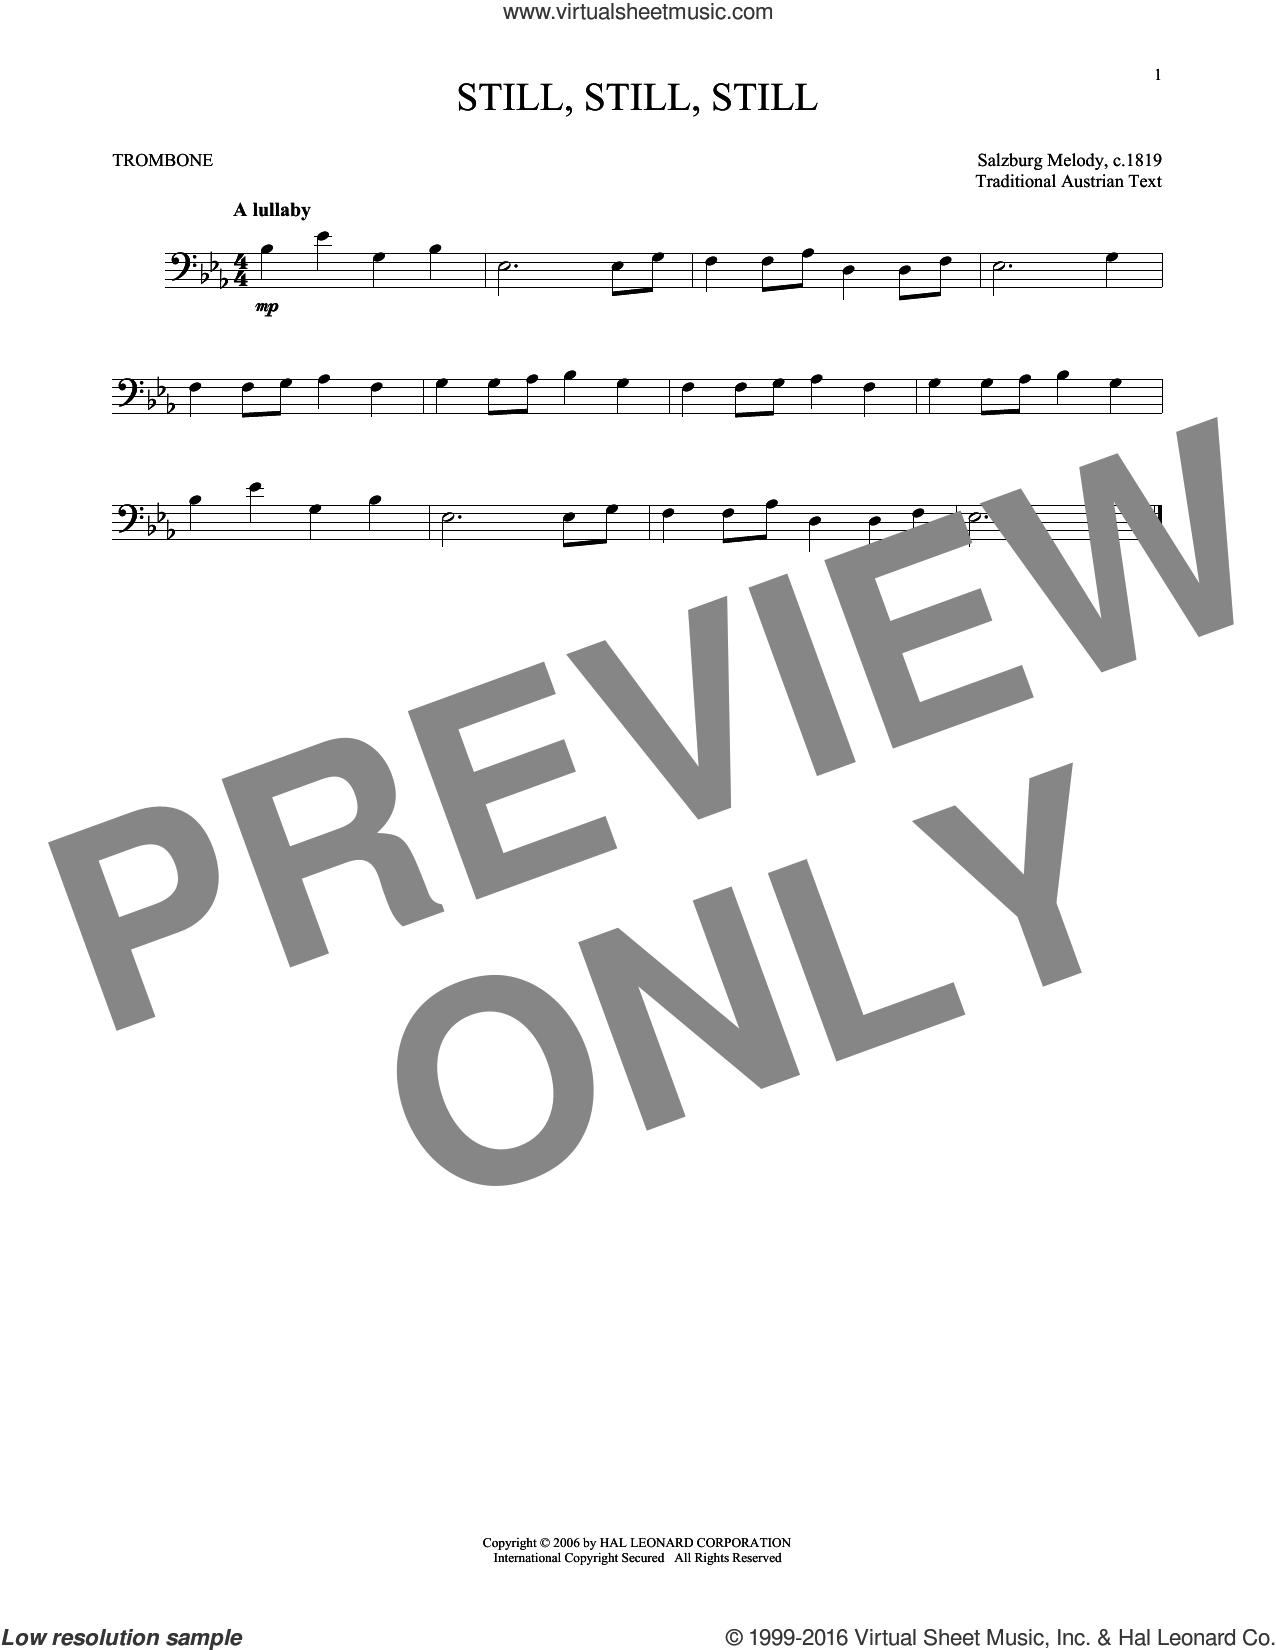 Still, Still, Still sheet music for trombone solo by Salzburg Melody c.1819 and Miscellaneous, intermediate skill level